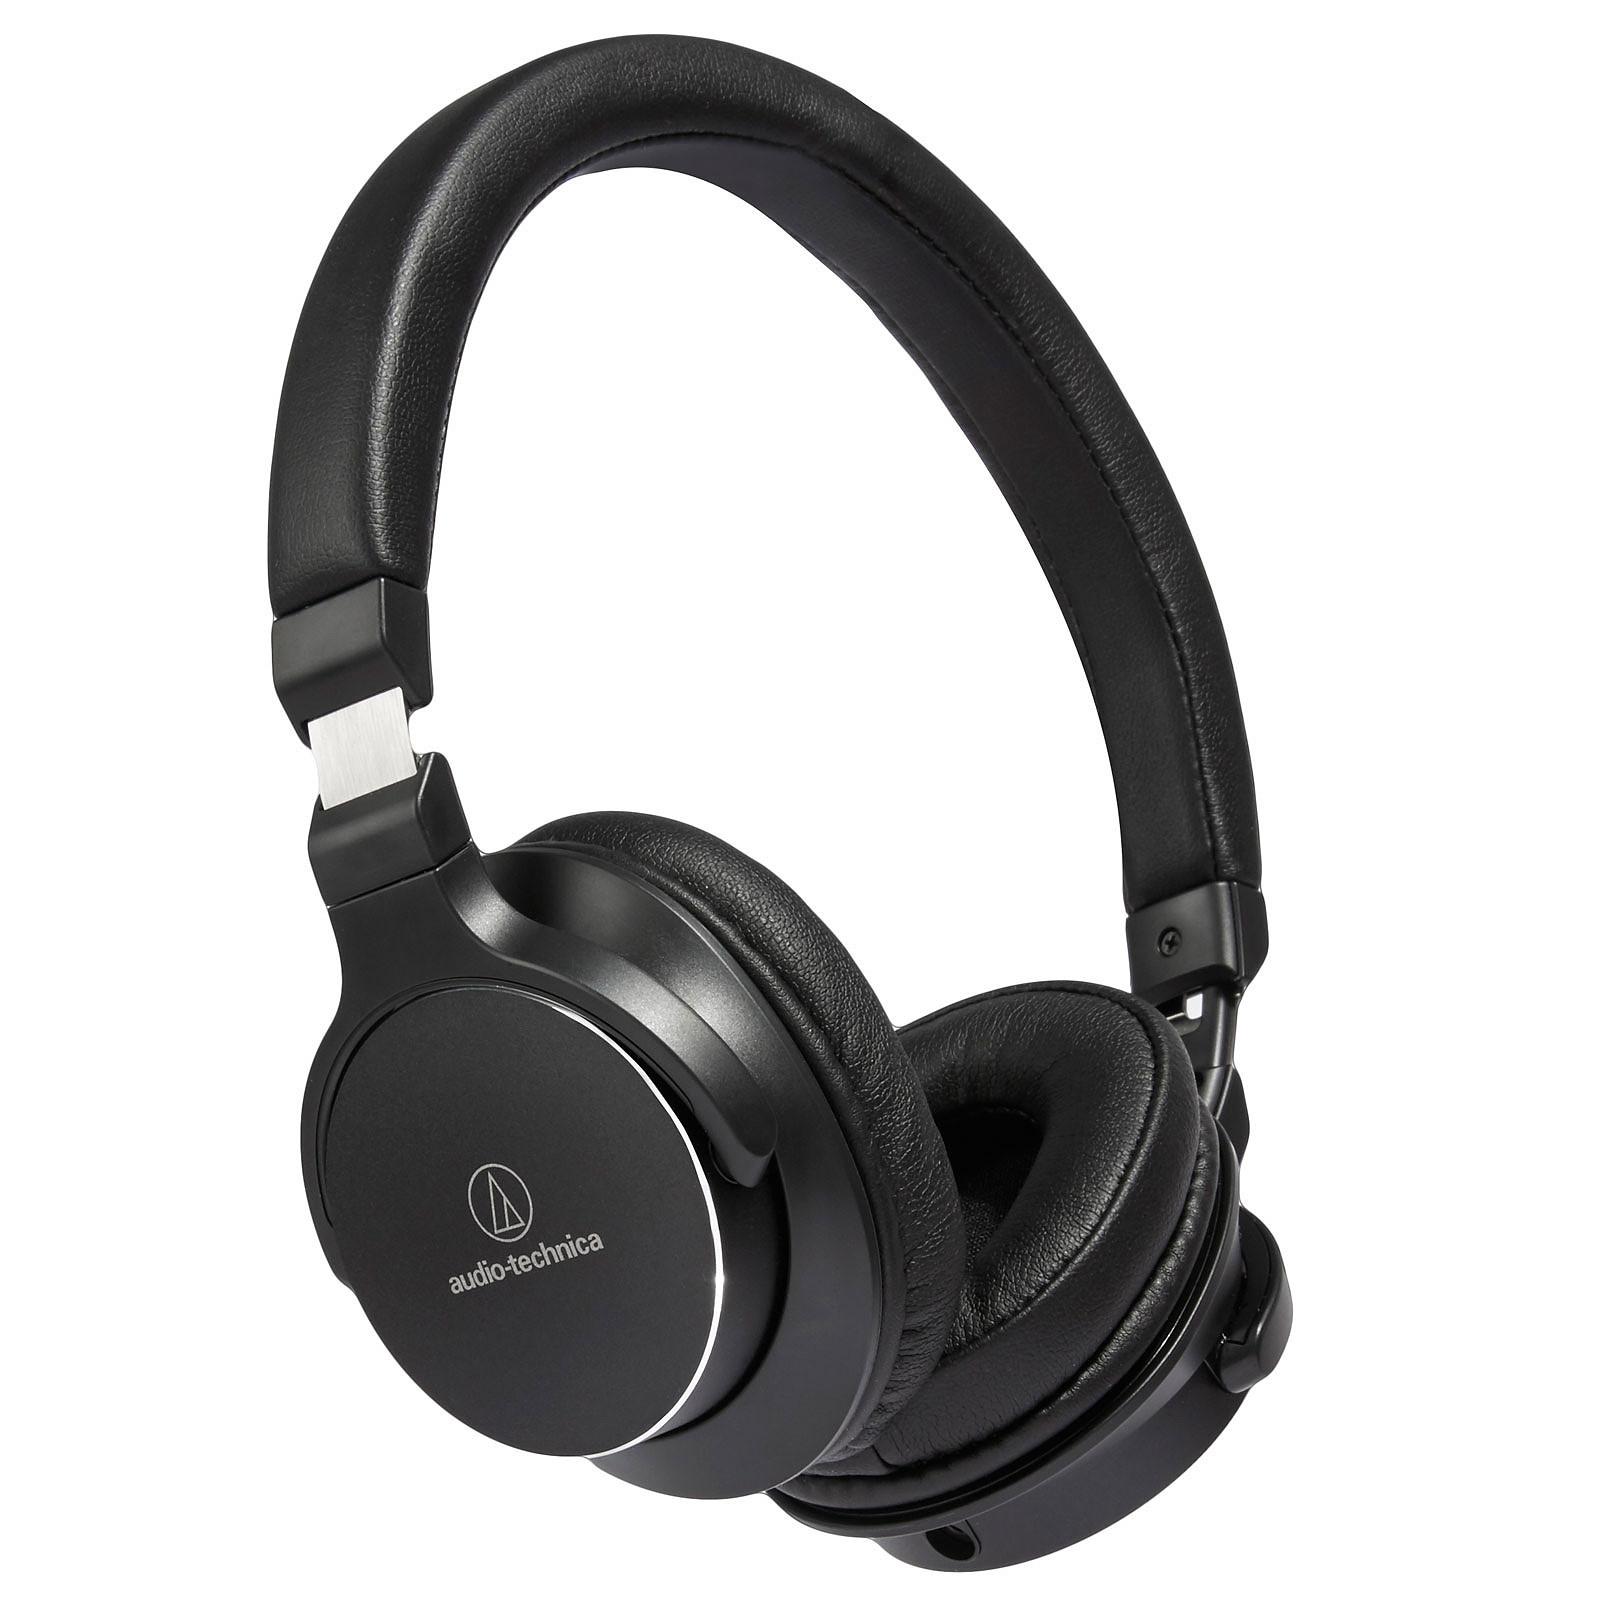 Audio-Technica ATH-SR5 Noir